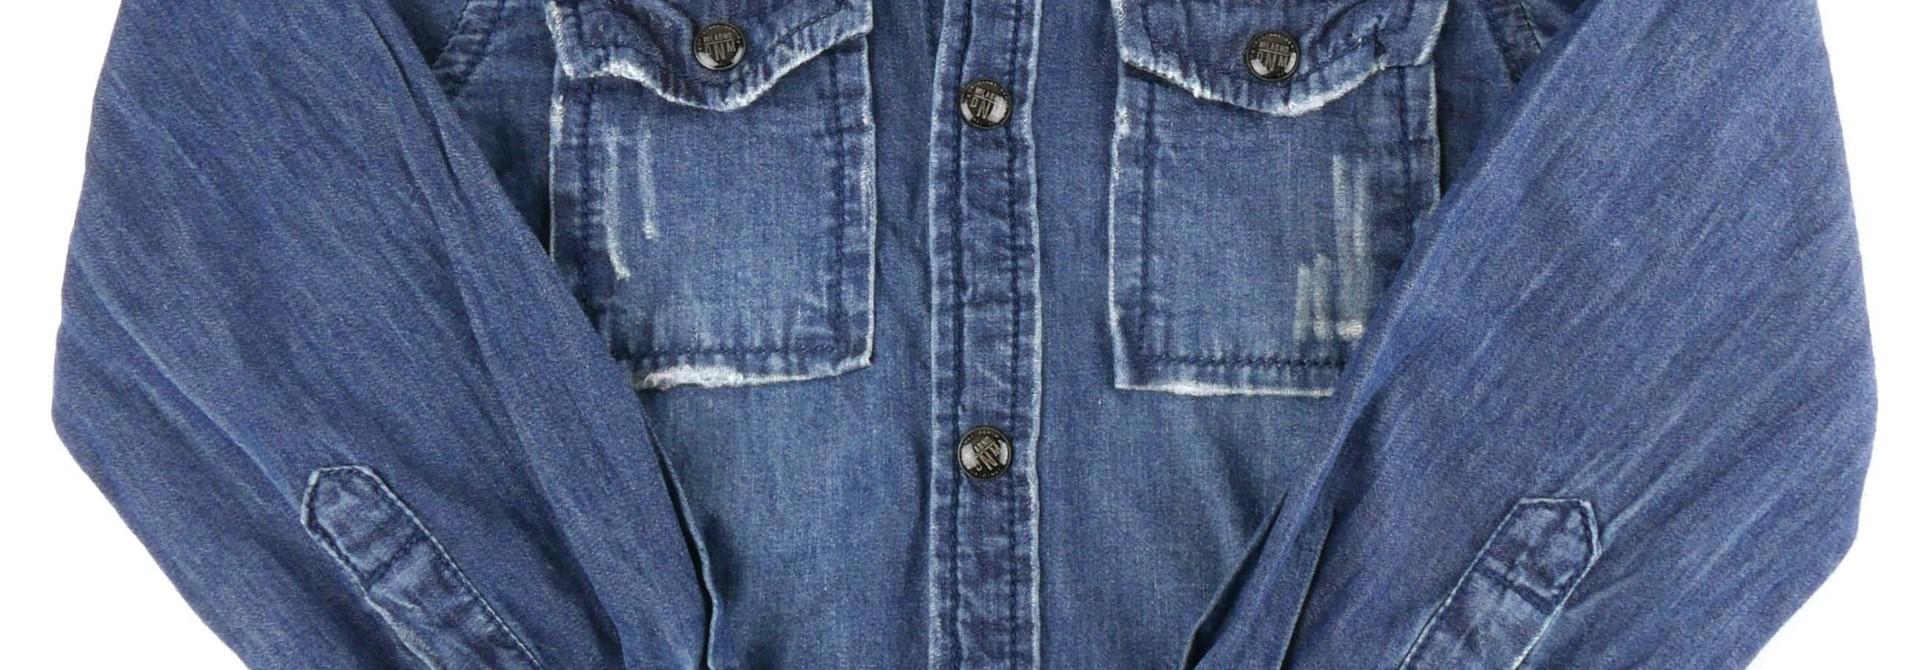 Jeans hemd Name It